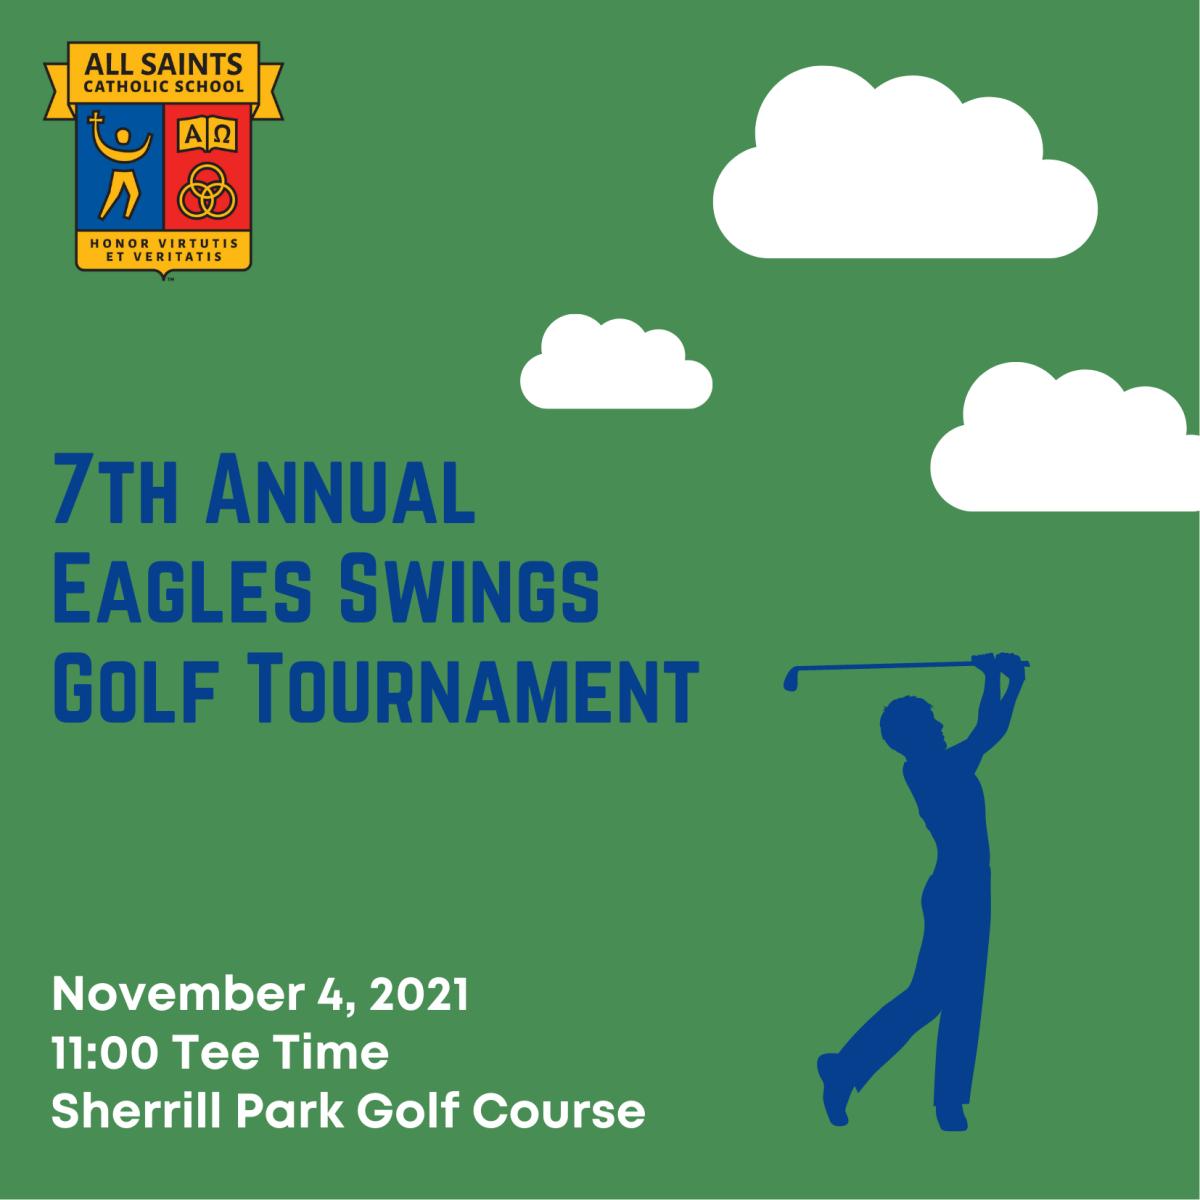 7th Annual Eagle Swings Golf Tournament